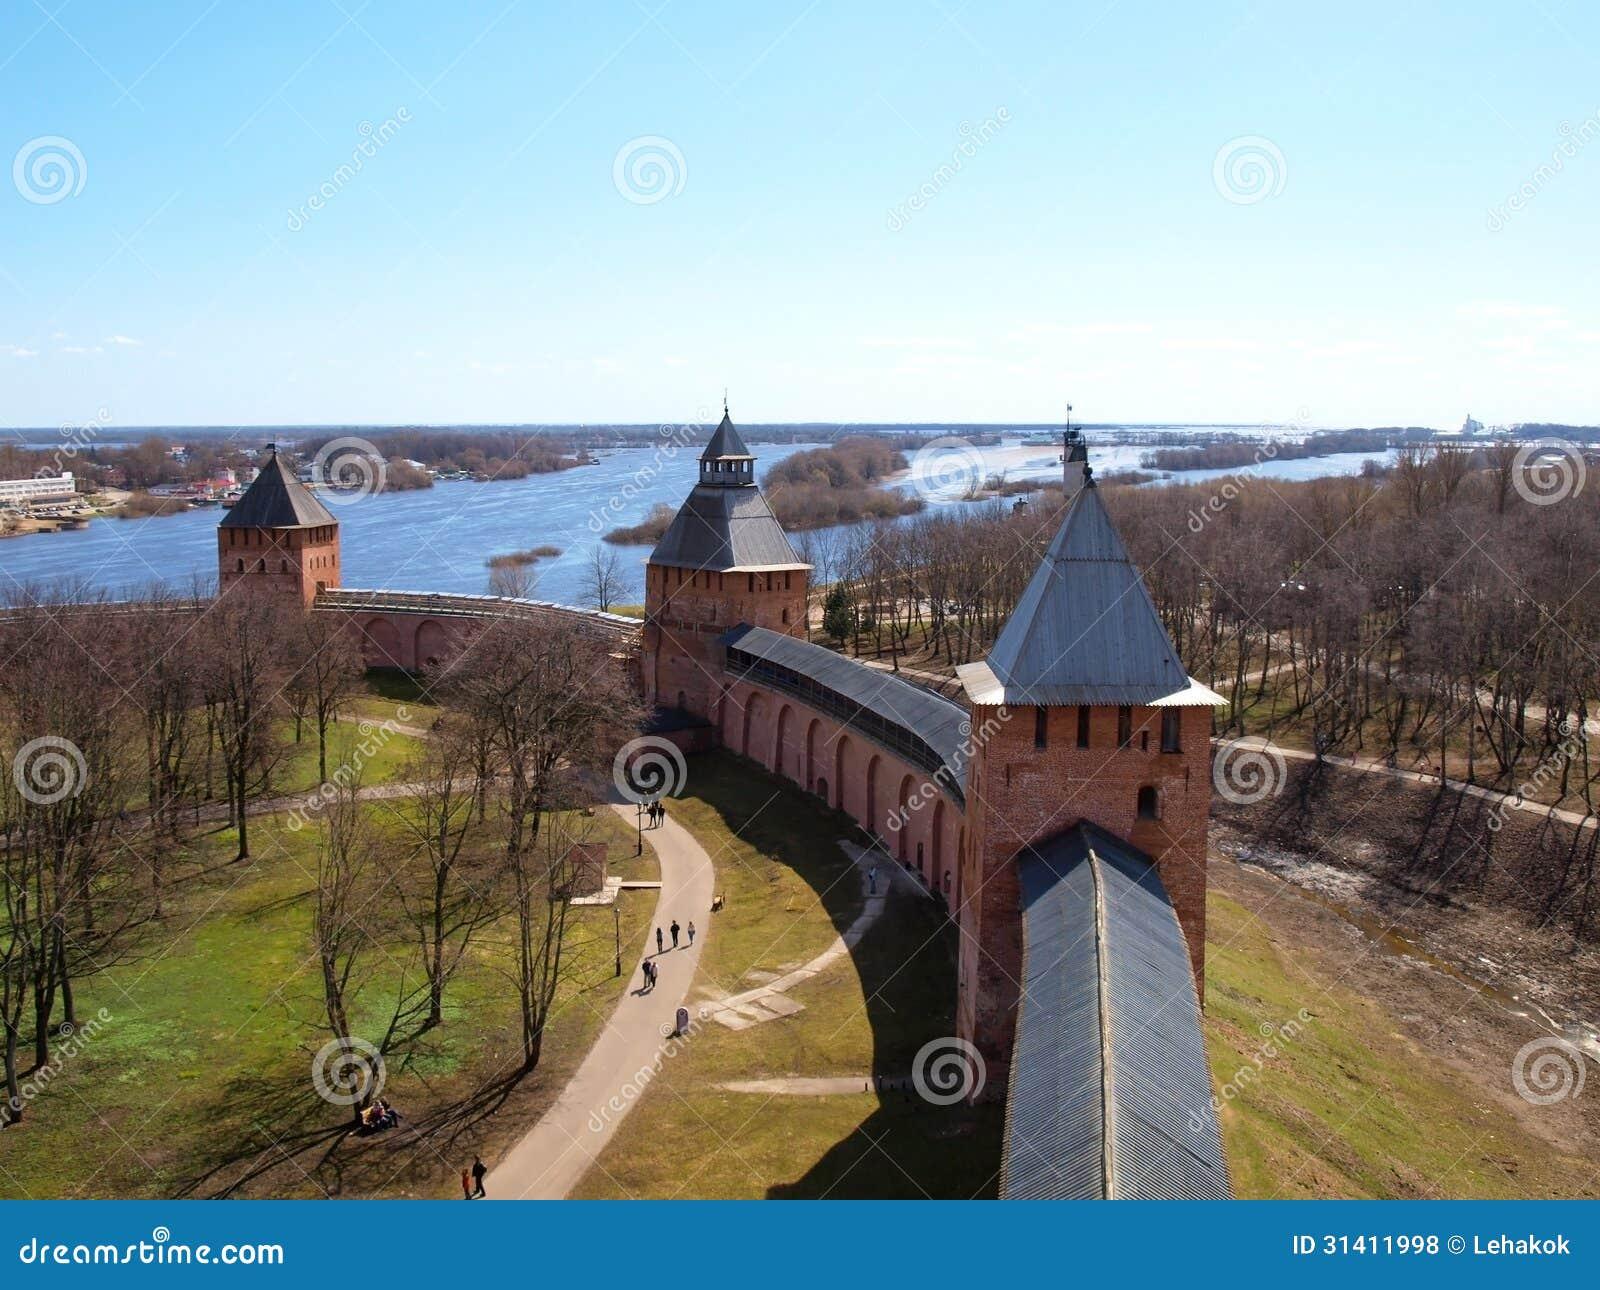 How to call Novgorod 76